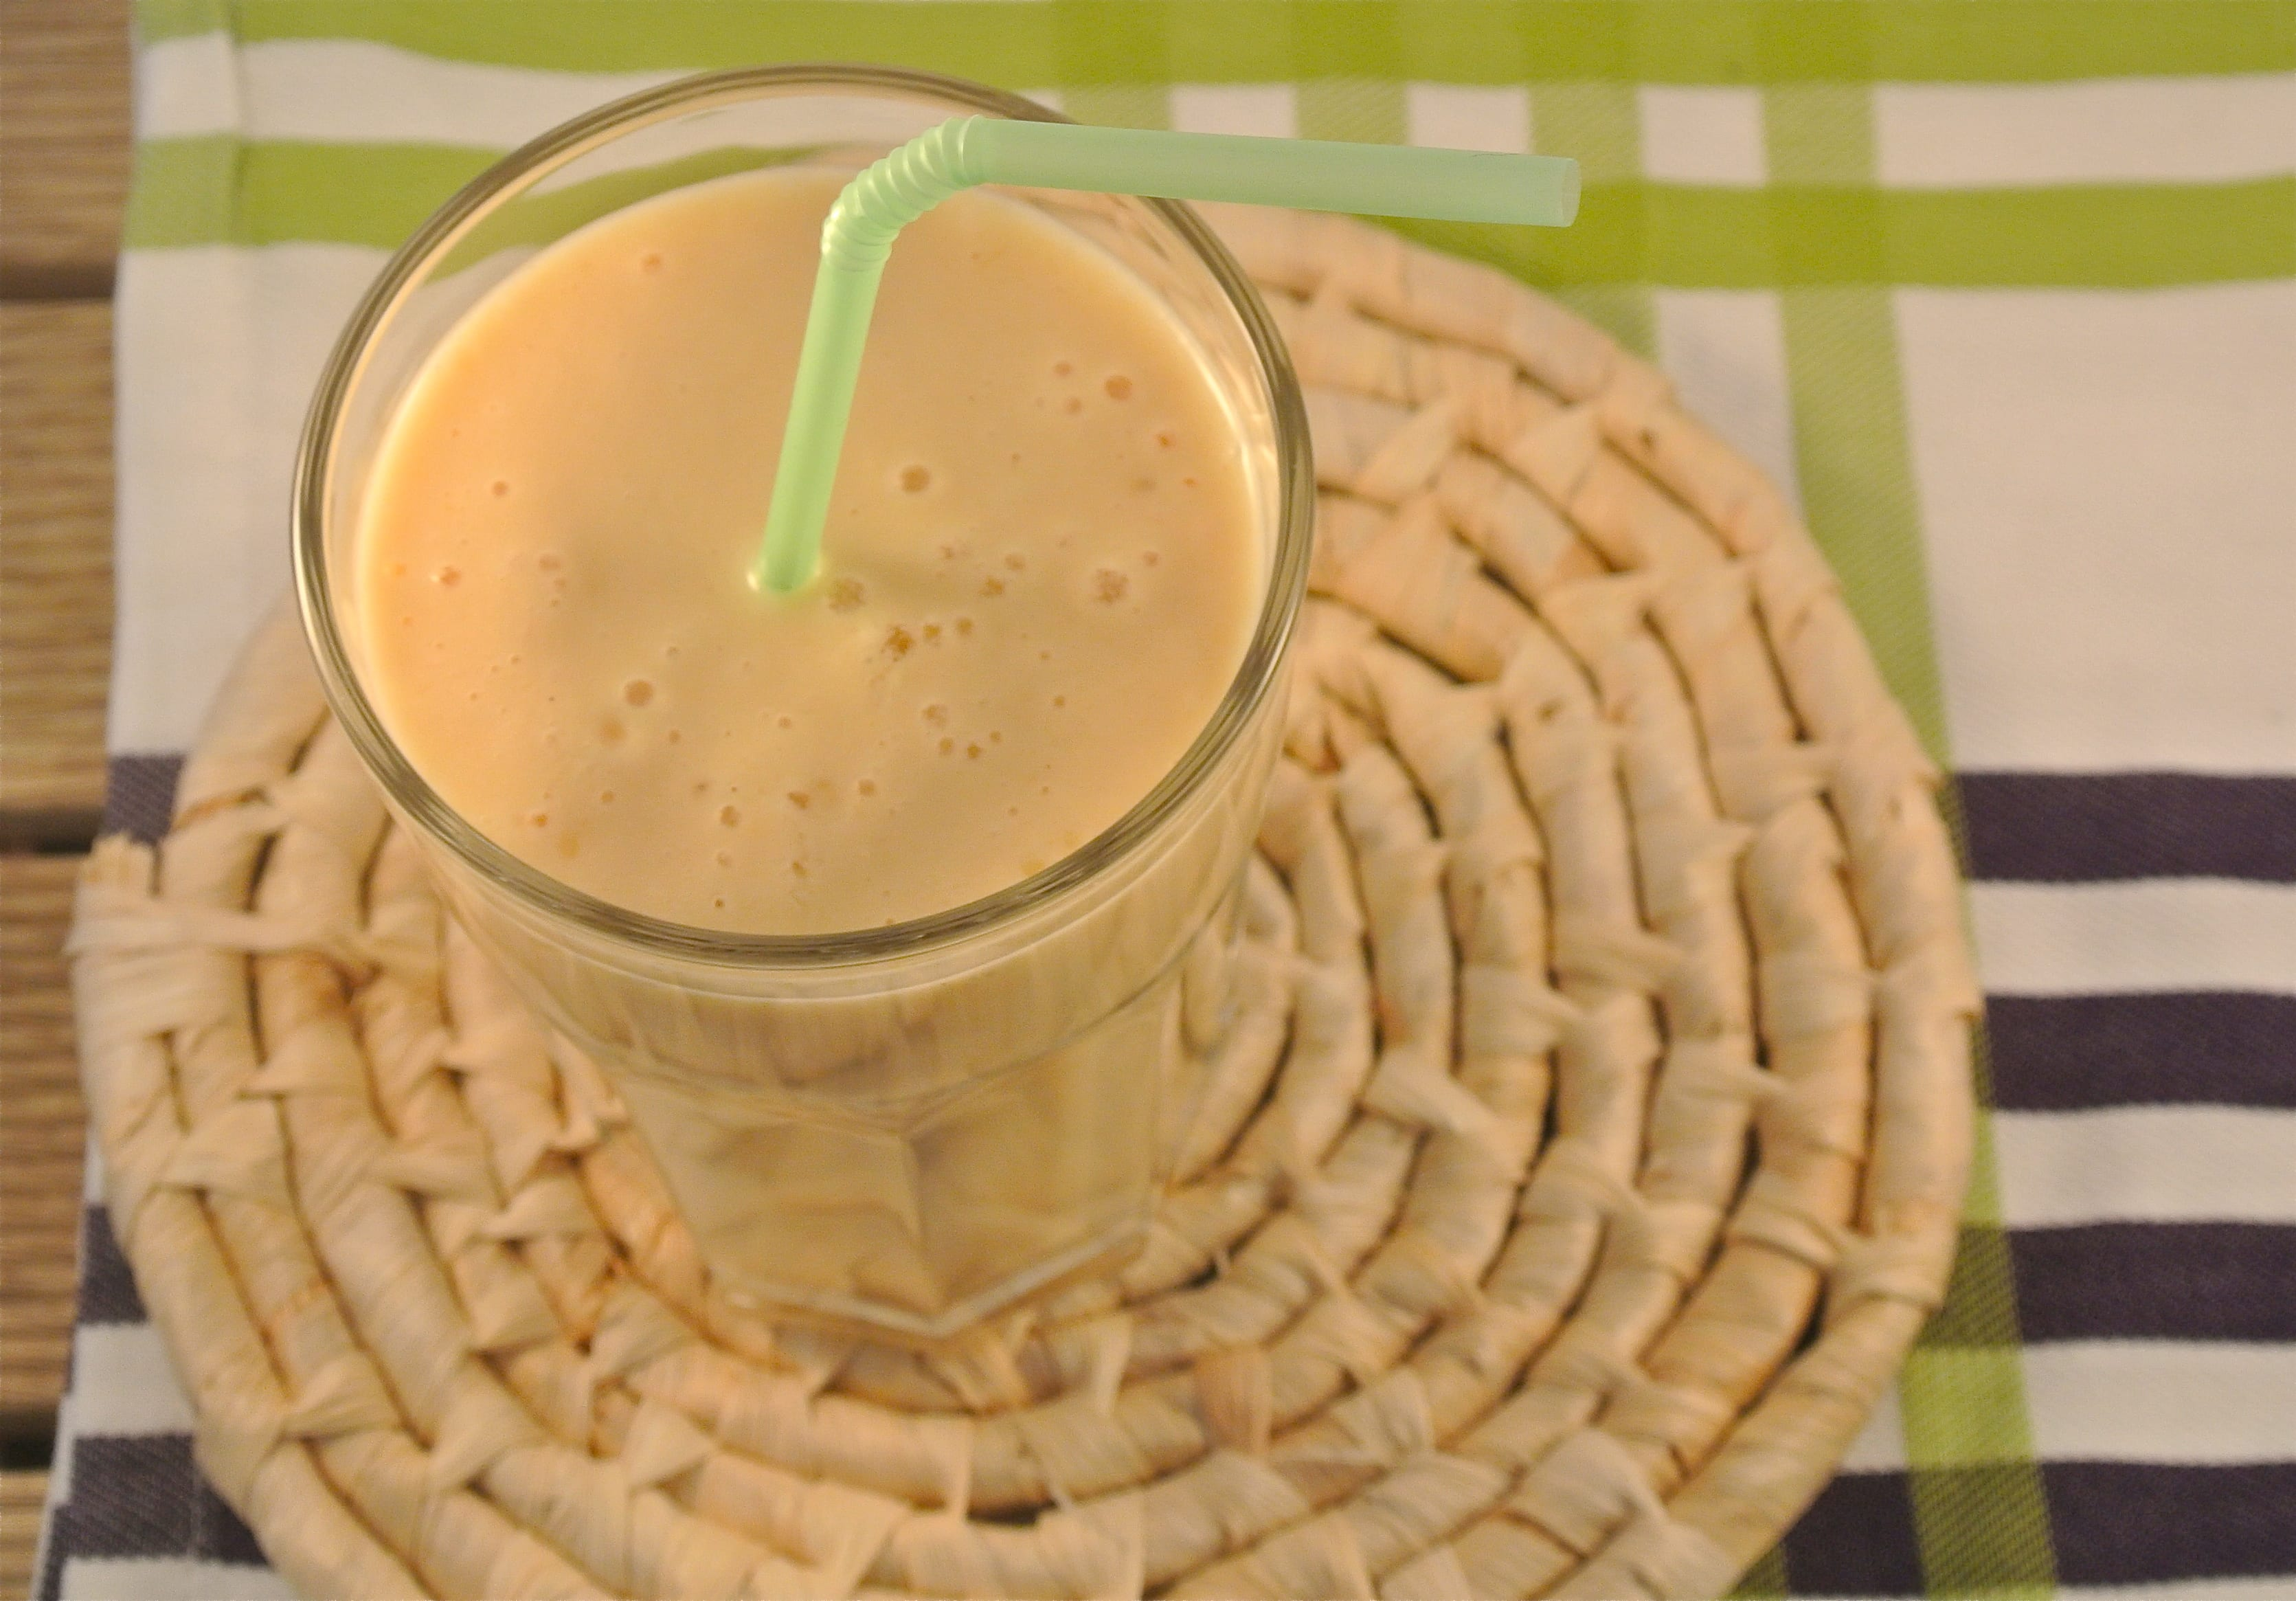 Mango-yoghurt smoothie